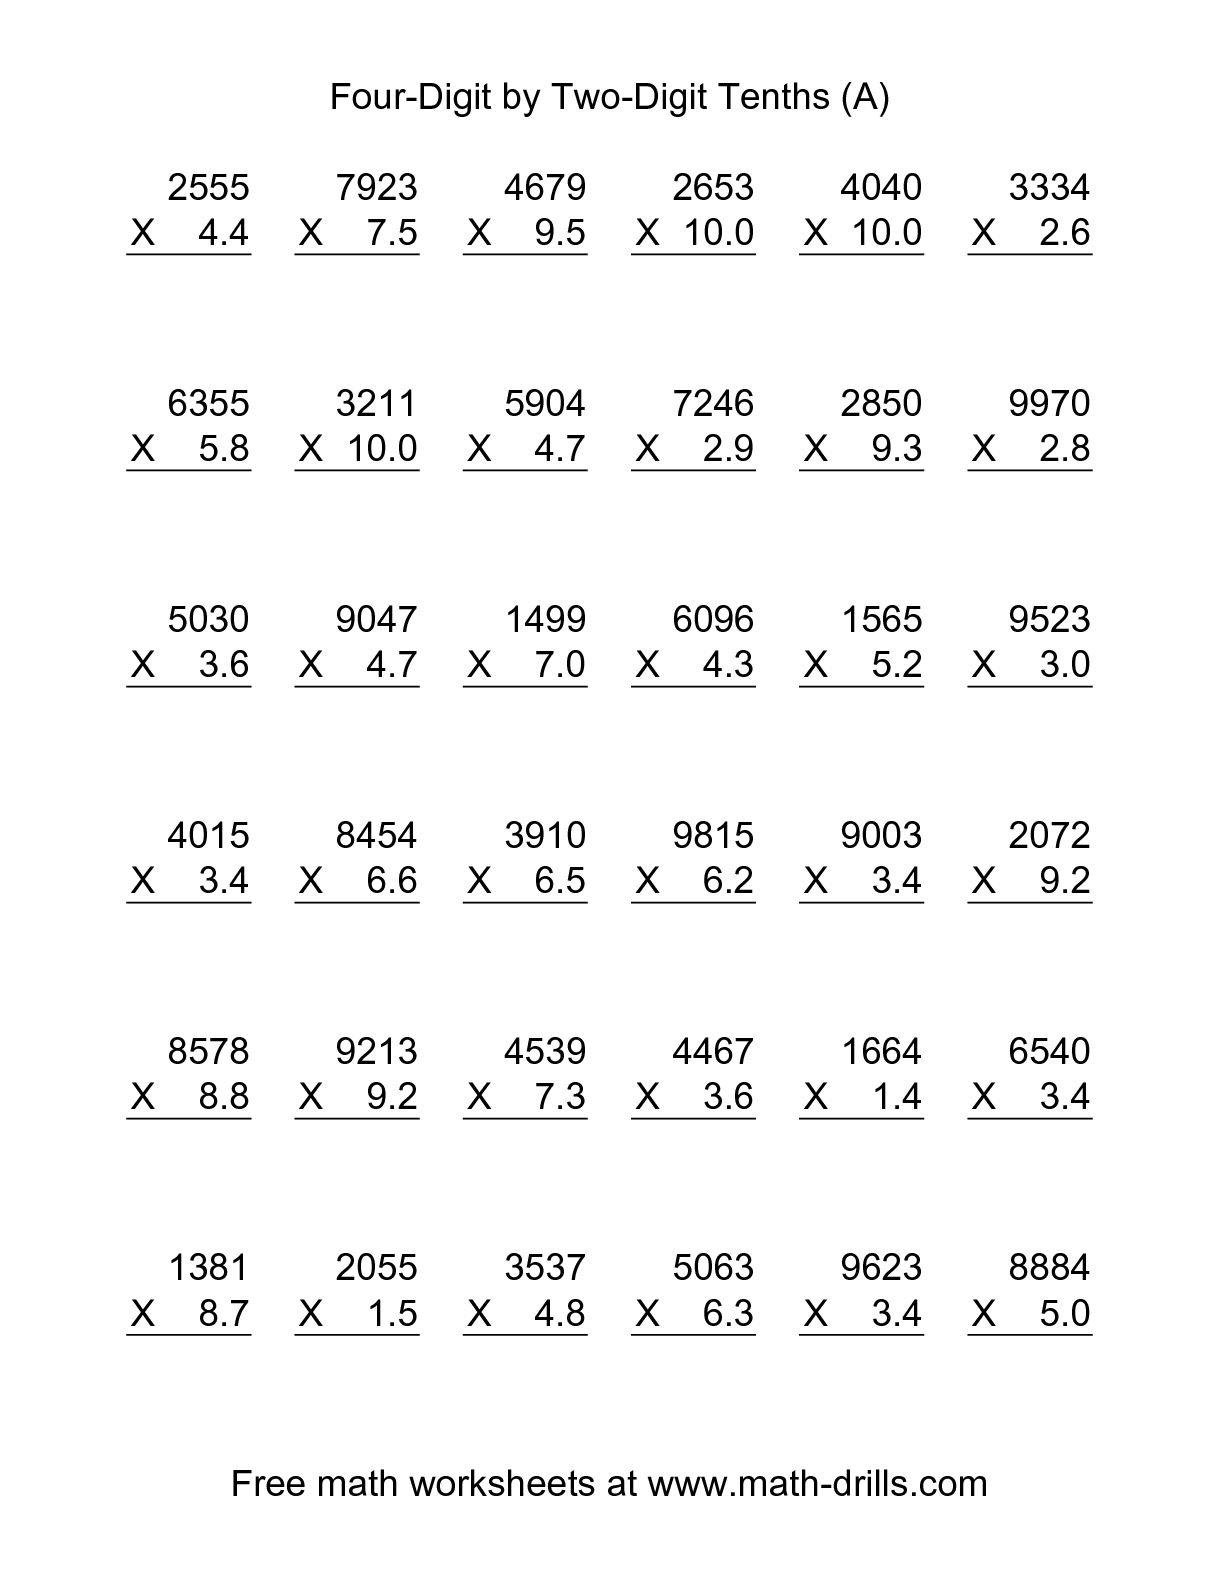 Multiplication Worksheets With Decimals : Cmediadrivers - Multiplying Decimals Free Printable Worksheets